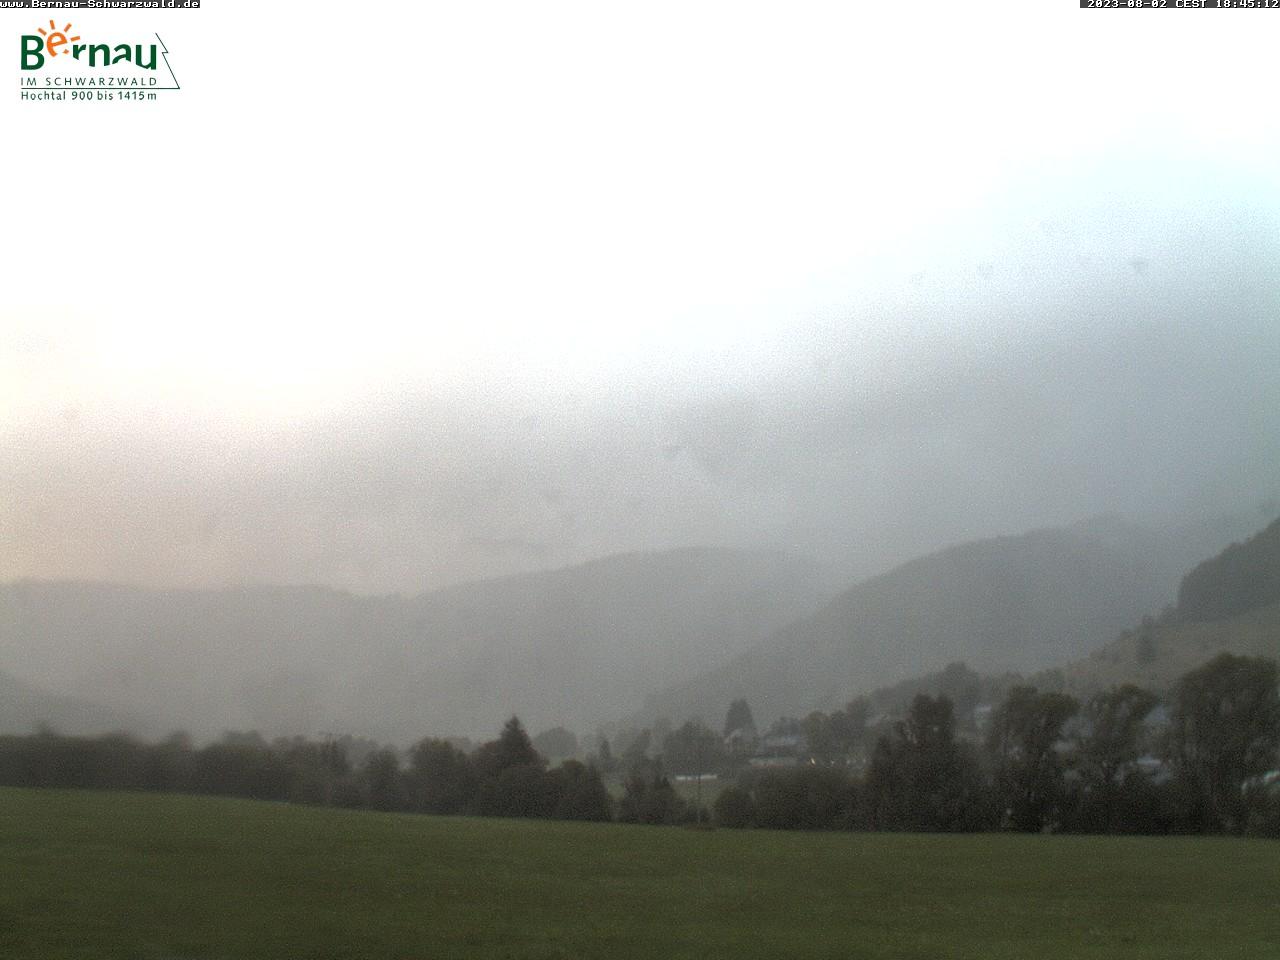 Webcam Bernau im Schwarzwald